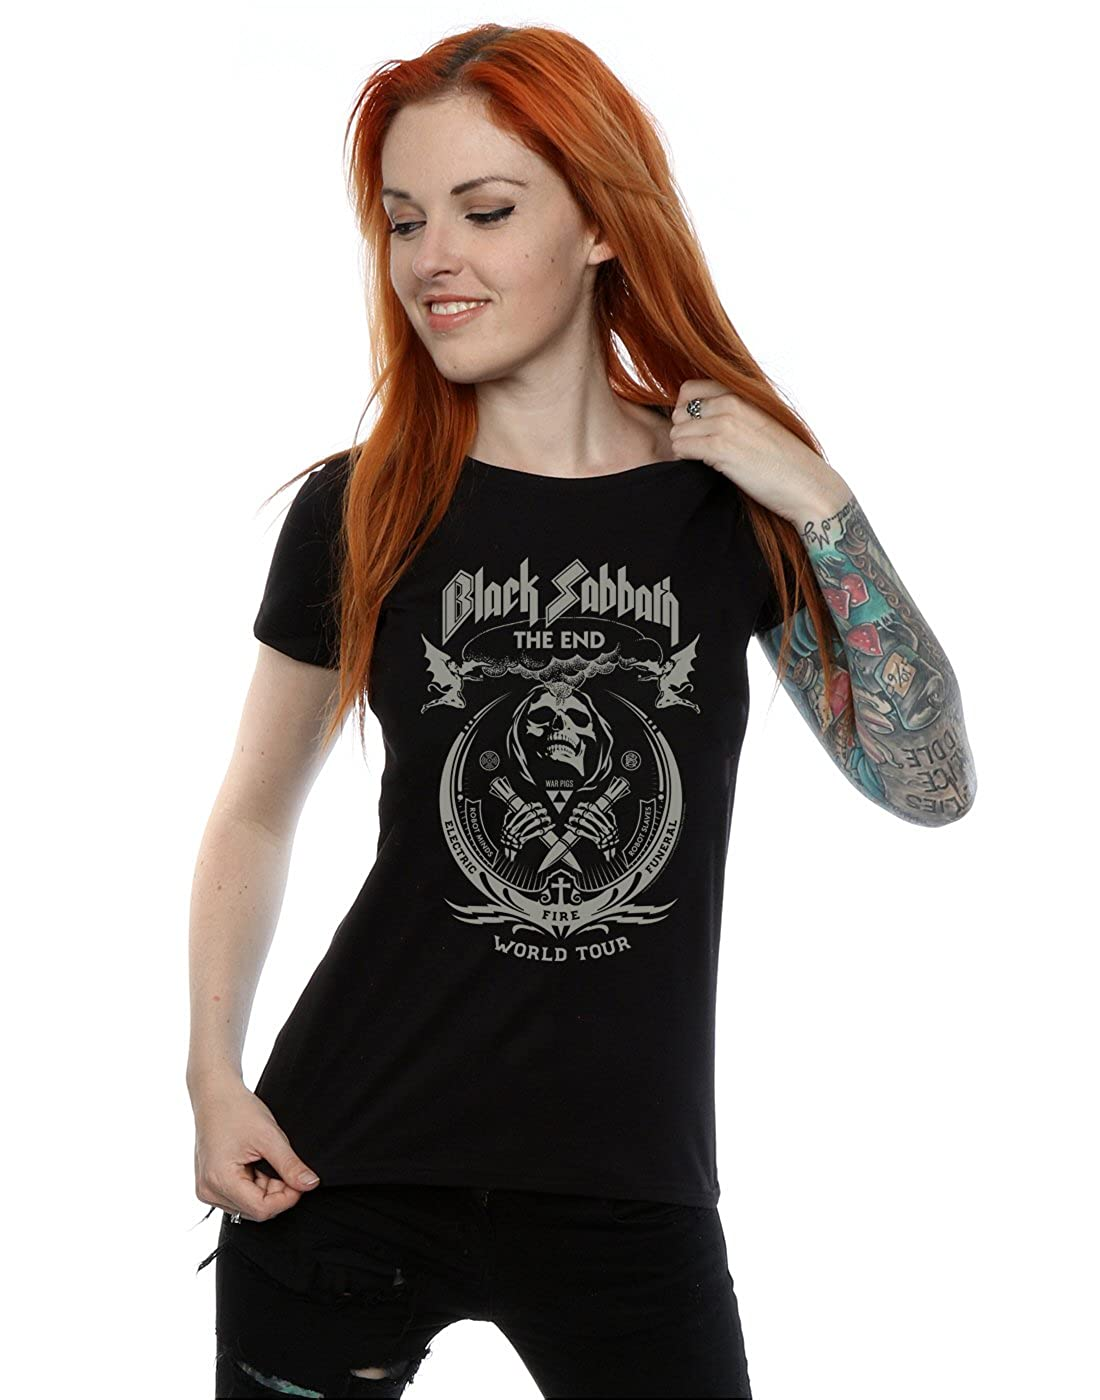 146a6dbfe1 Amazon.com  Black Sabbath Women s The End World Tour T-Shirt  Clothing